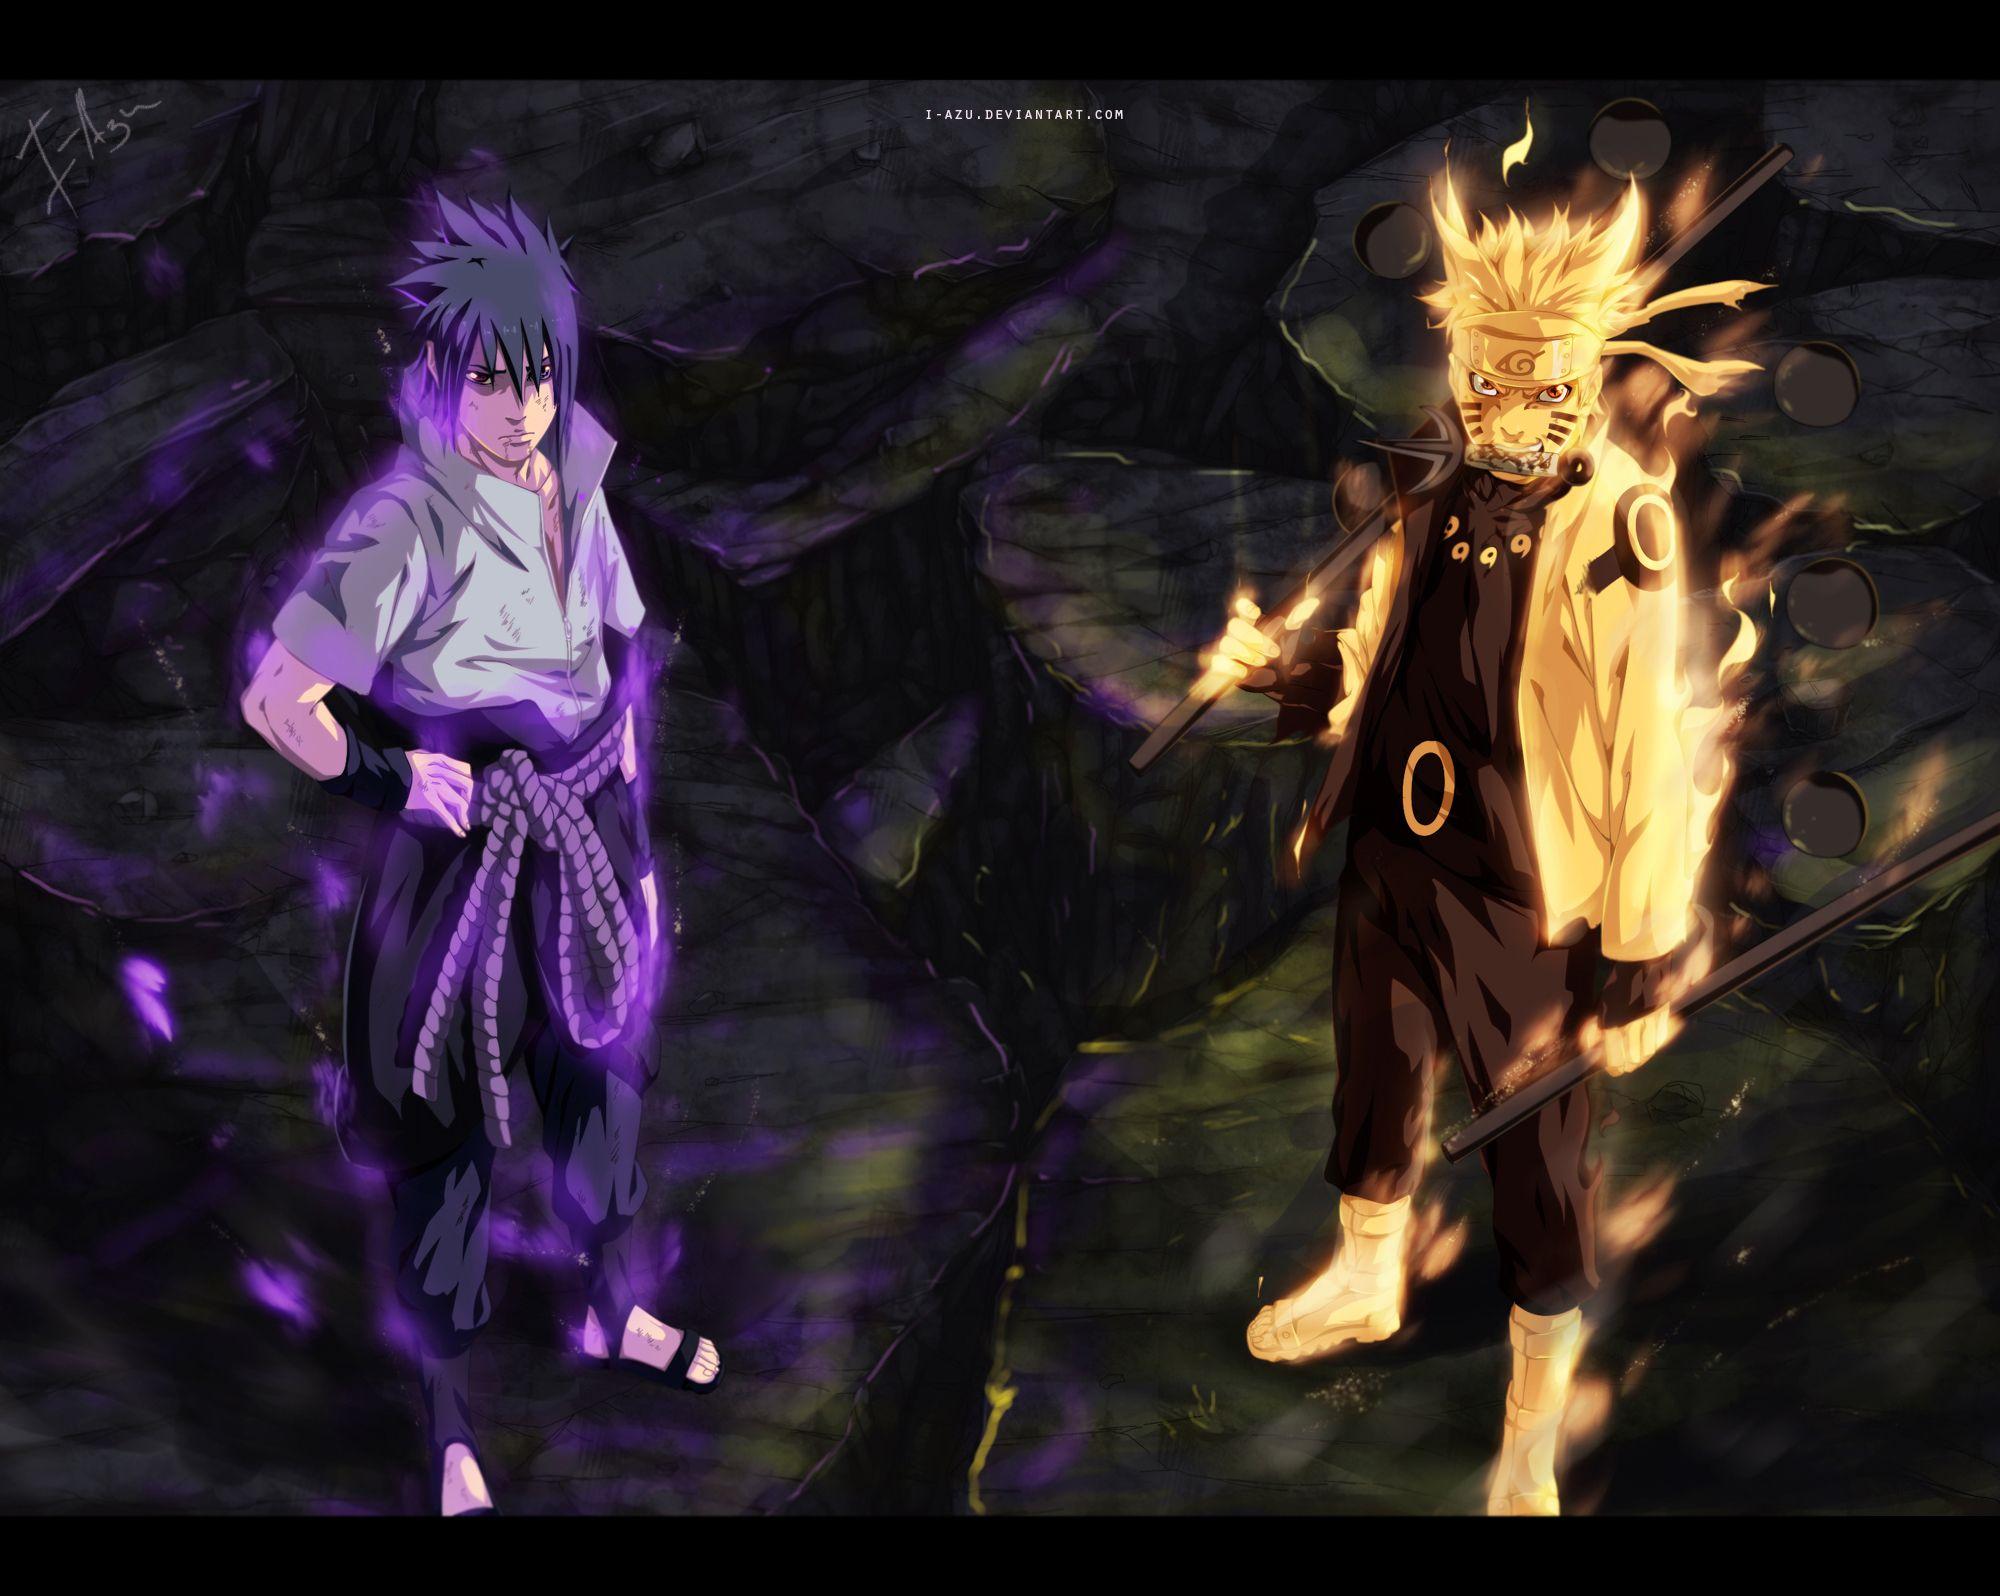 Naruto Wallpaper Hd Resolution On Wallpaper 1080p Hd Can T